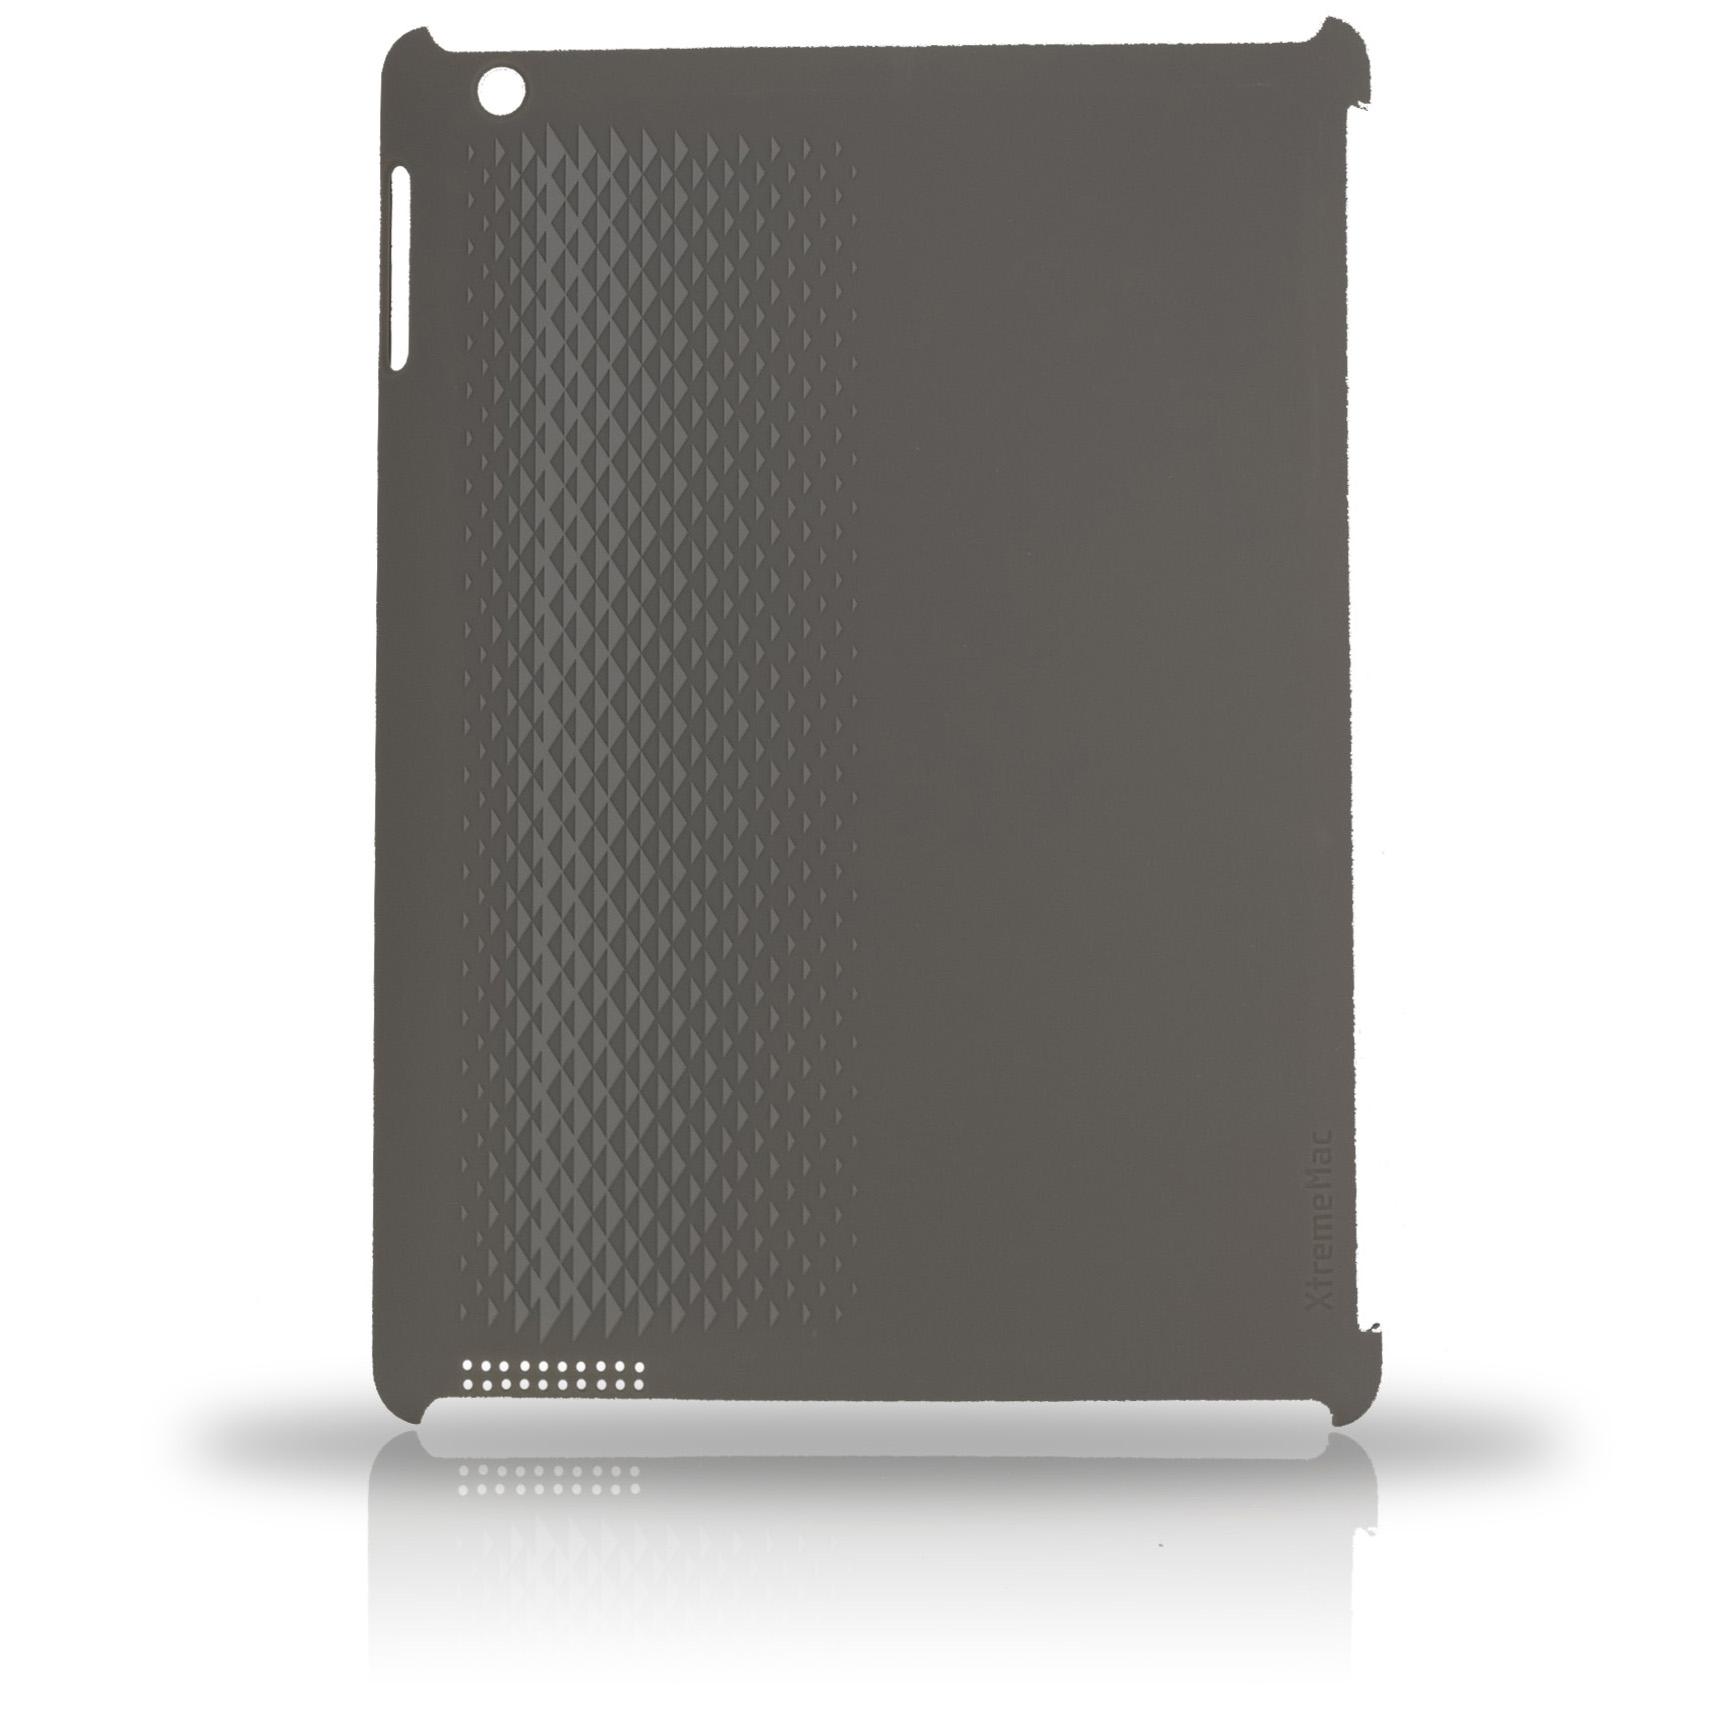 XtremeMac MicroShield Silk Screen Ultra Thin Case for iPad 2 3 4 Dark 2861936